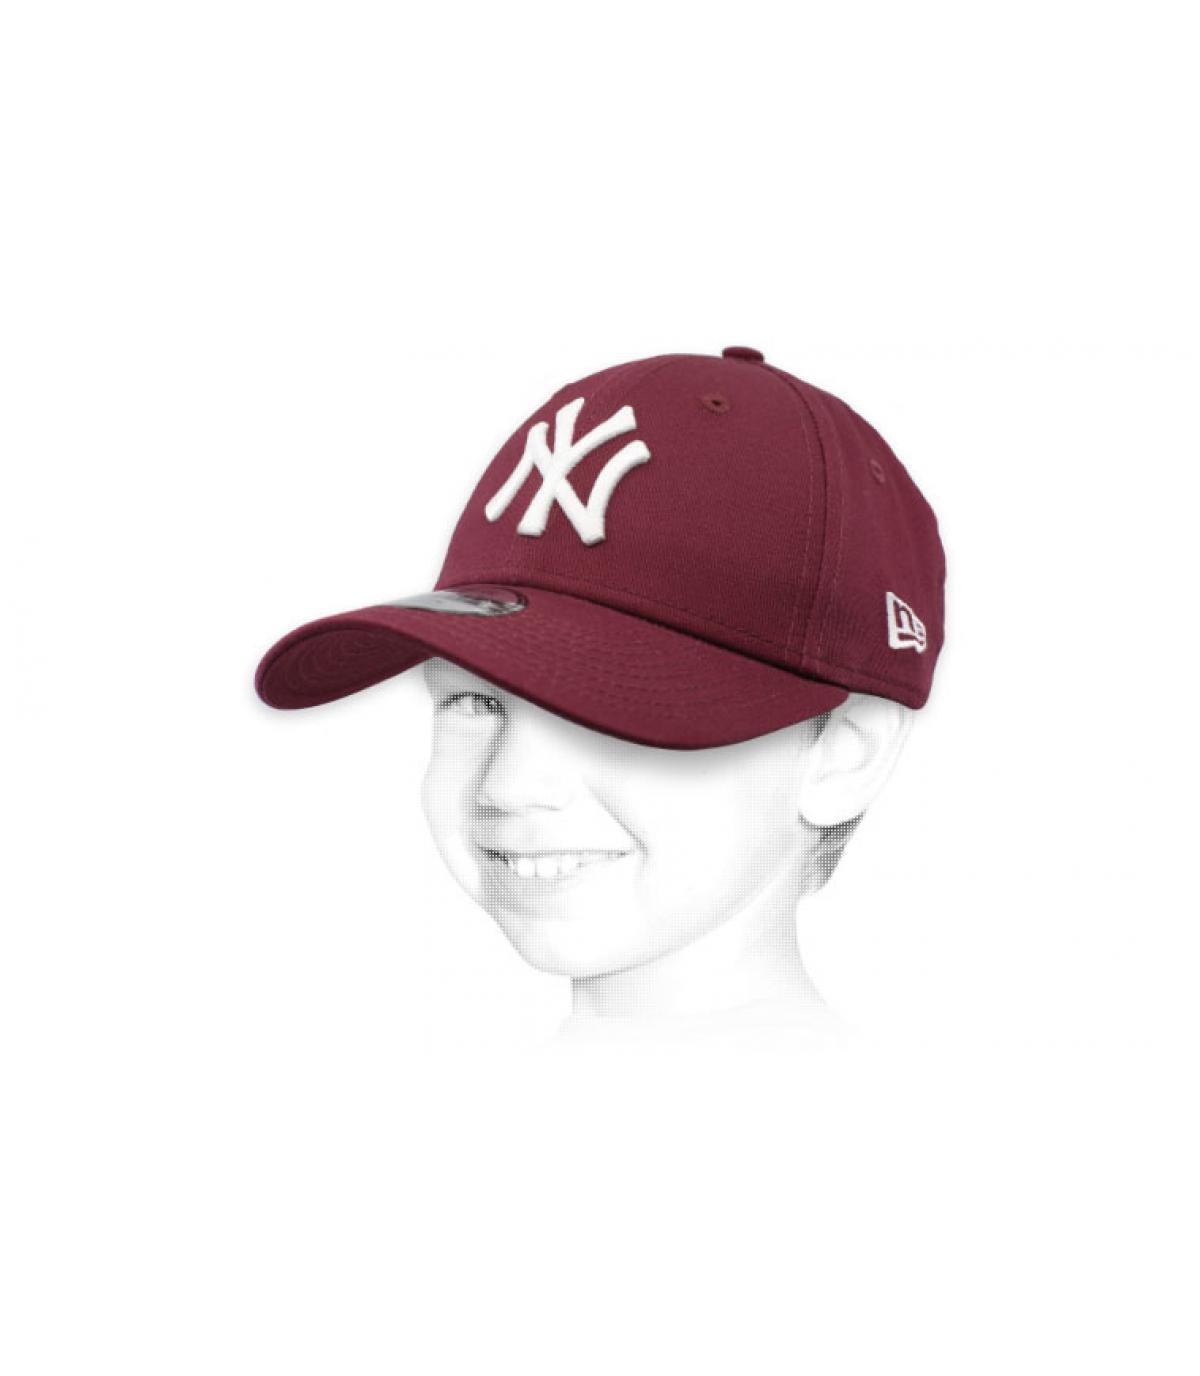 purple NY child cap